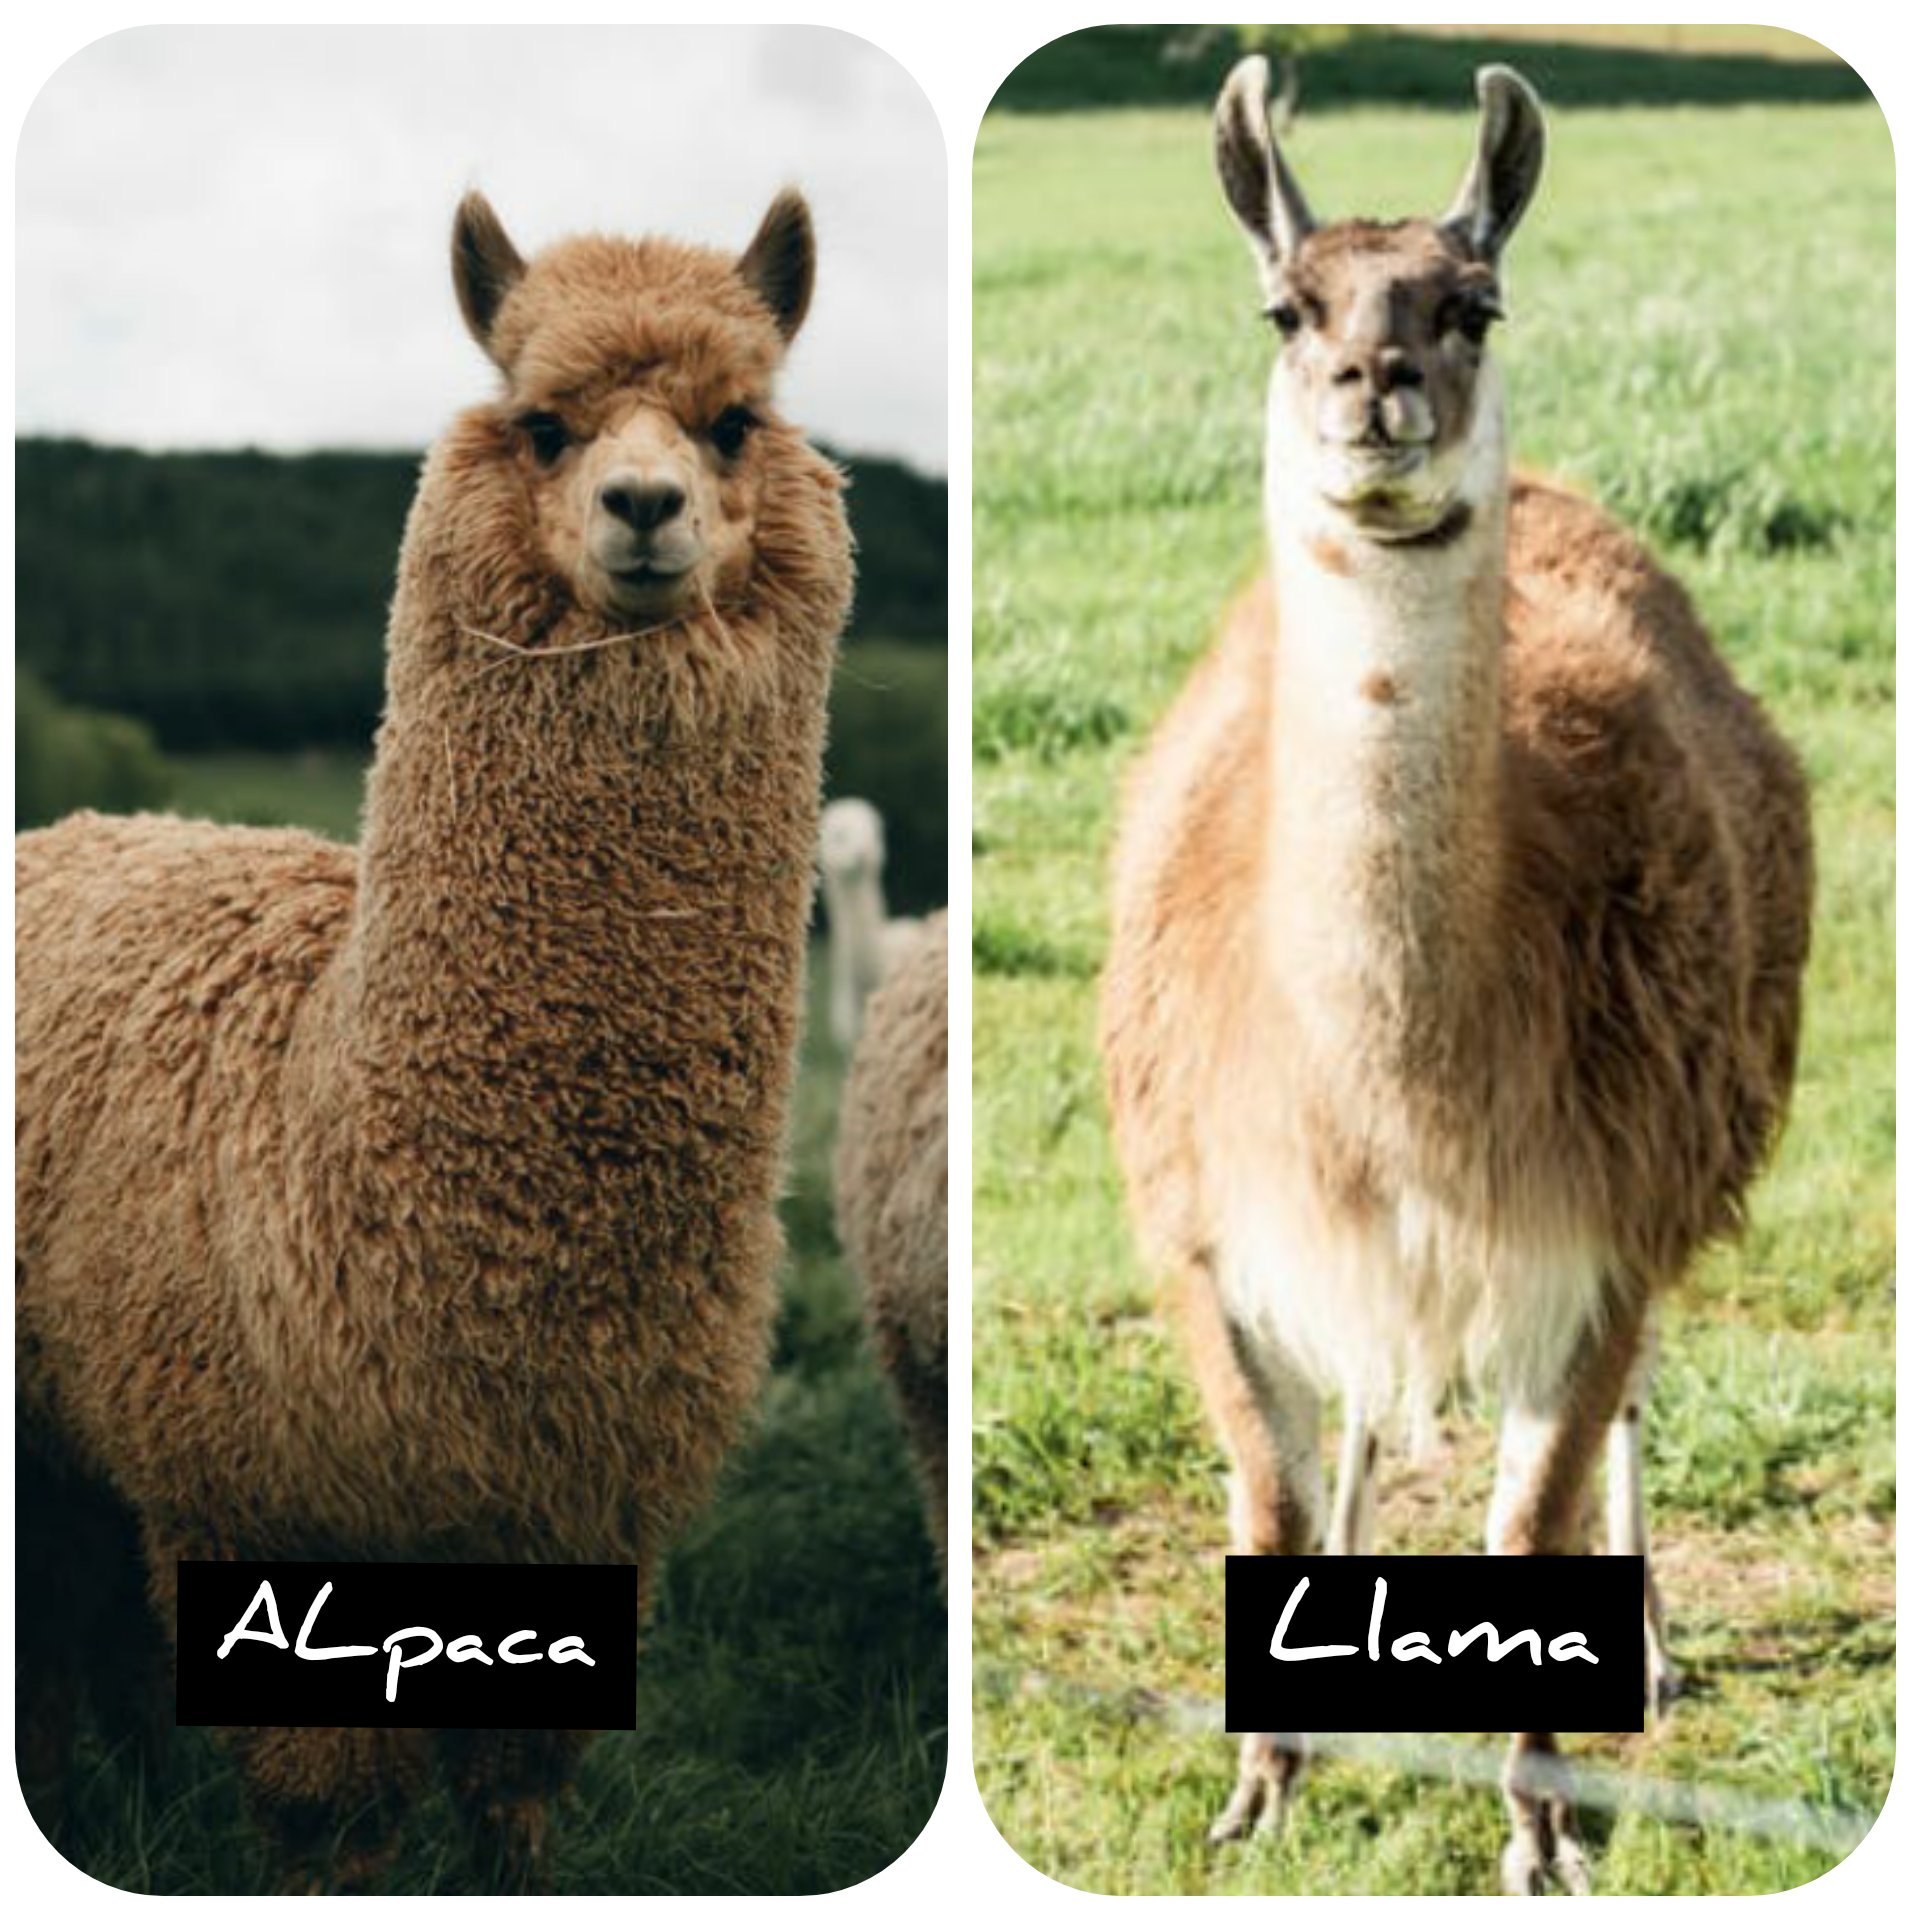 Difference between alpaca and llama